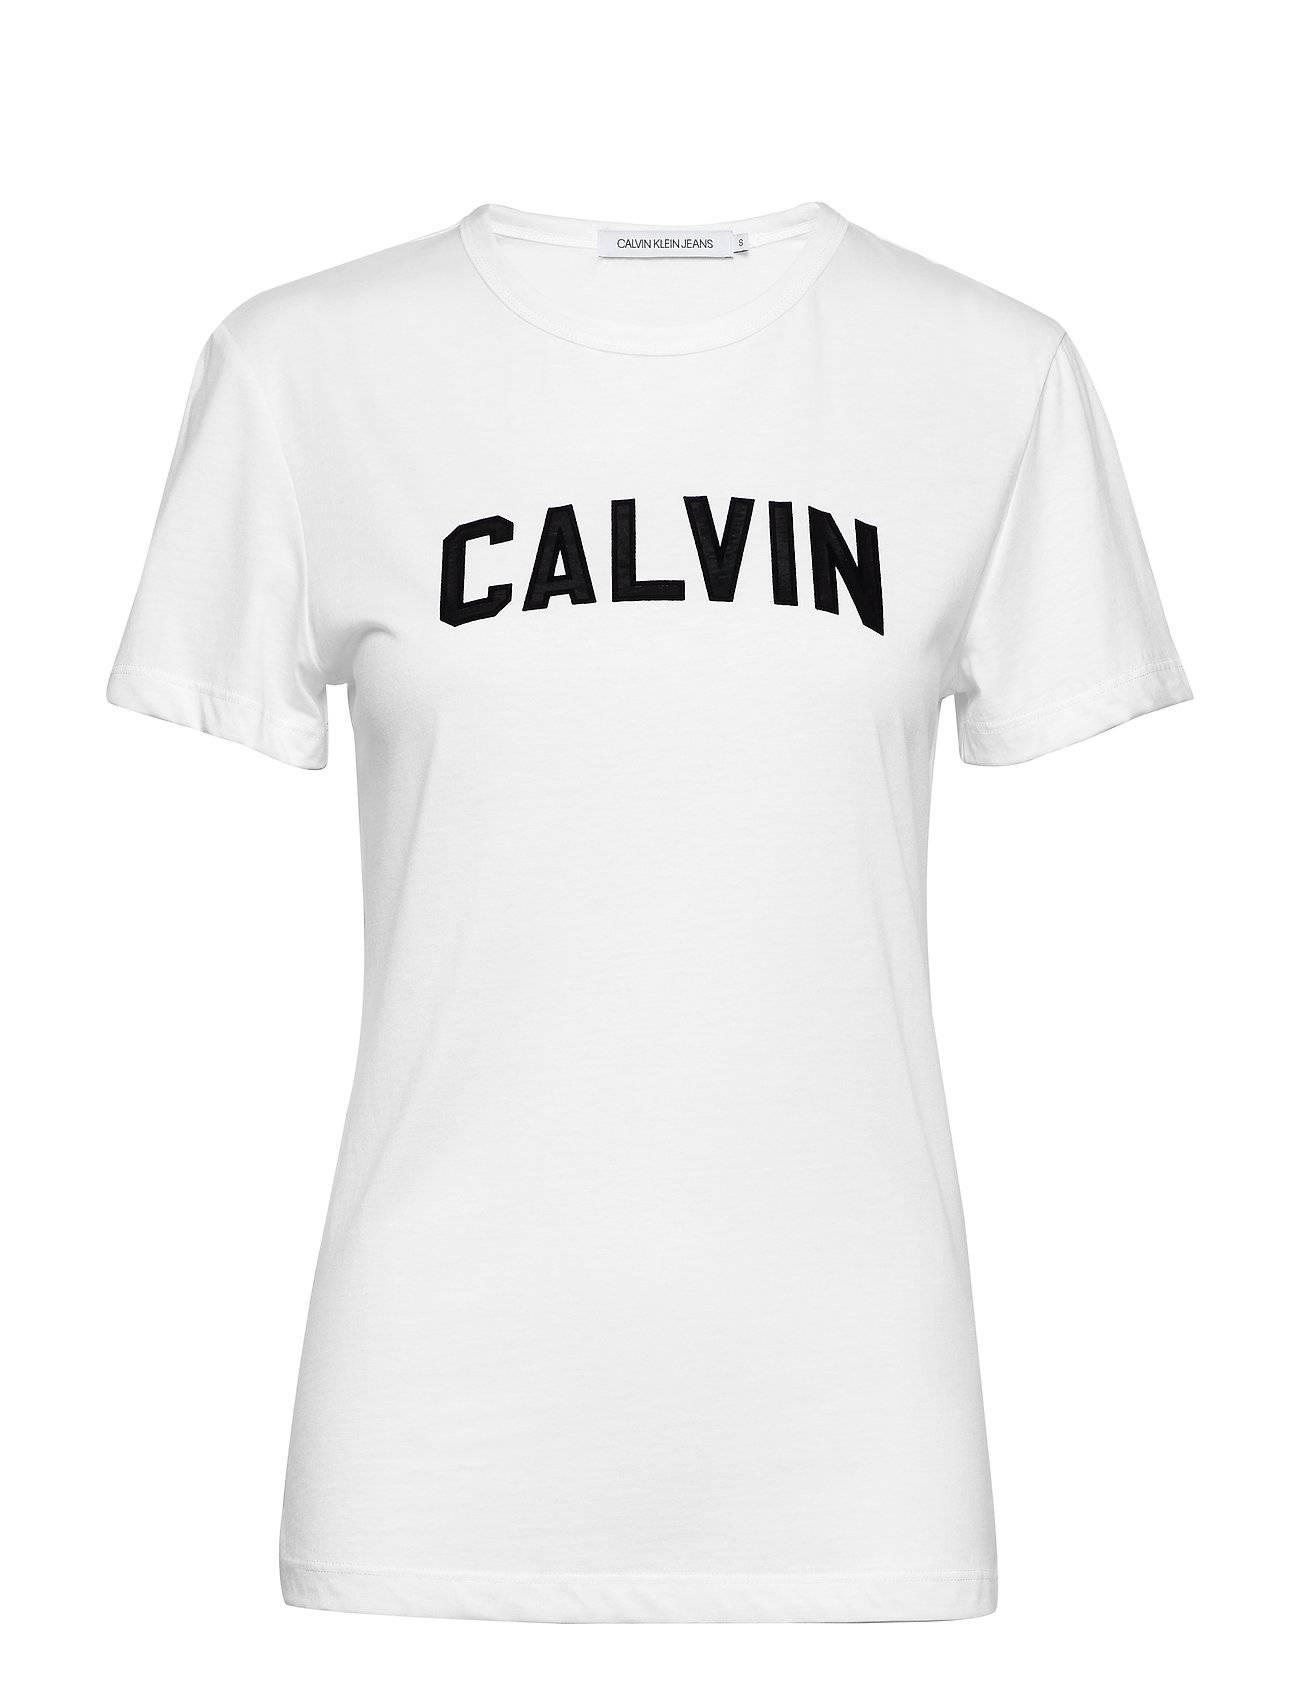 Image of Calvin Varsity Calvin Slim Tee T-shirts & Tops Short-sleeved Valkoinen Calvin Klein Jeans